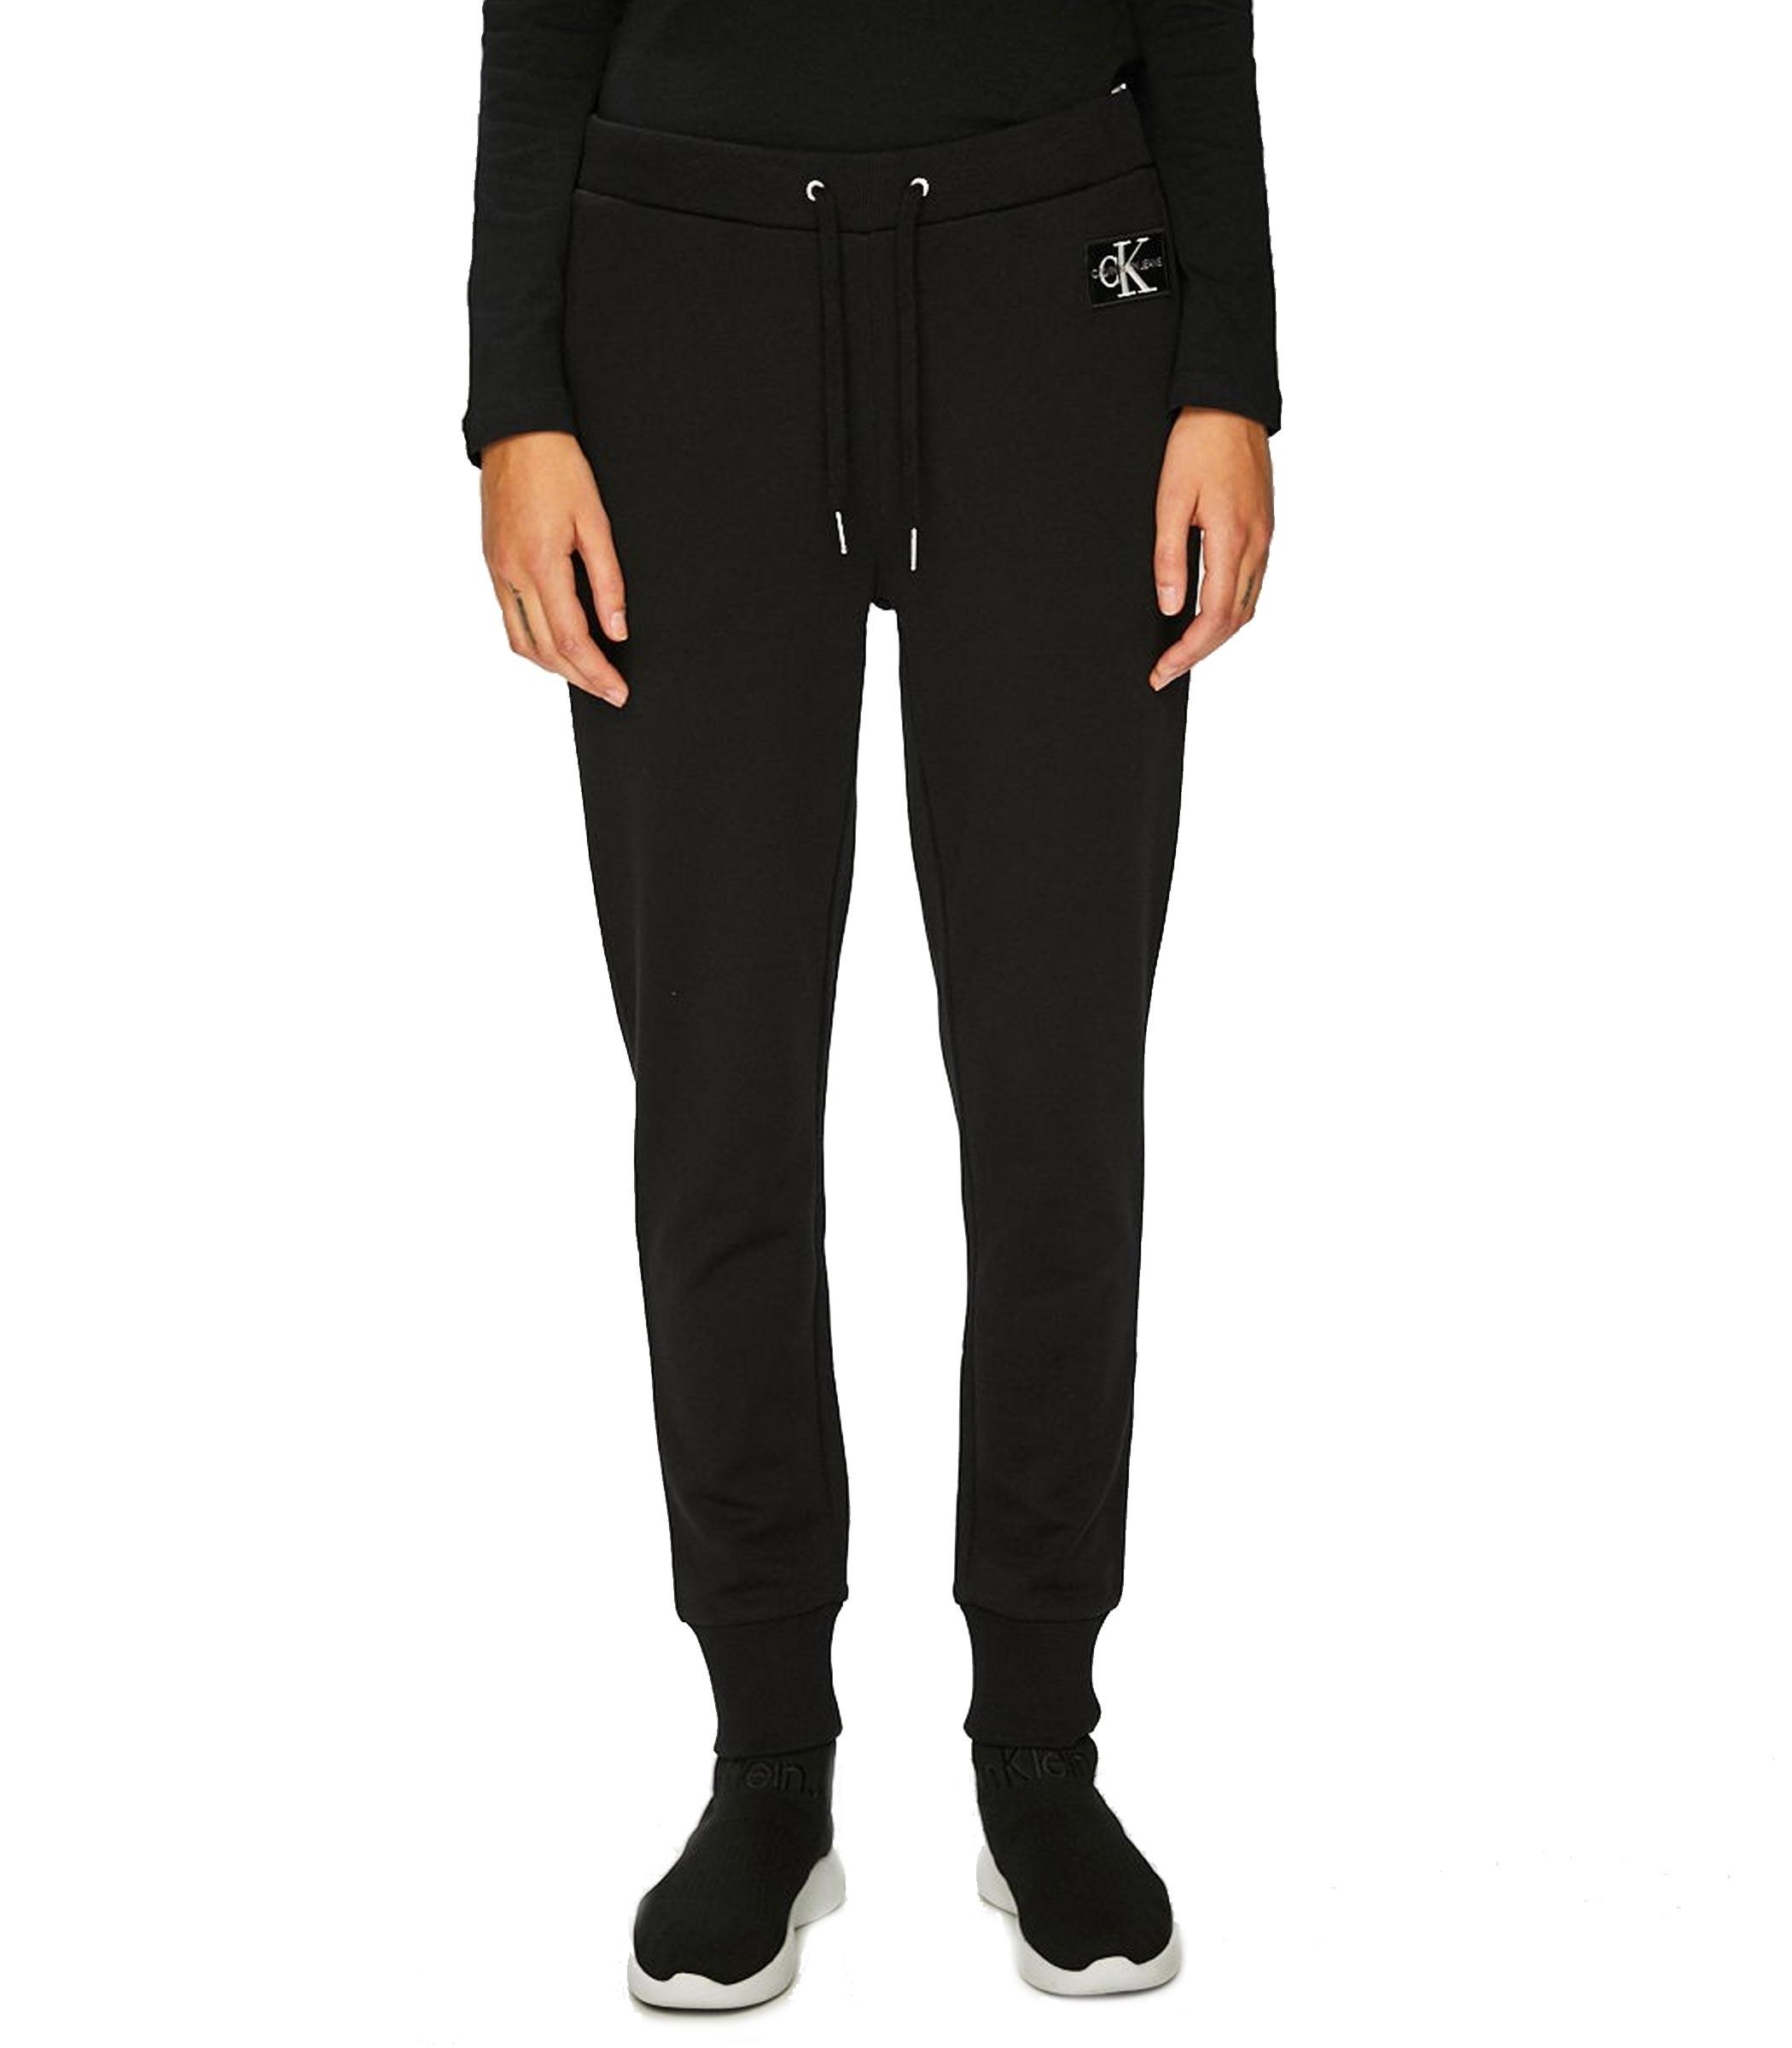 best sneakers 00bff b2713 Pantalone tuta Calvin Klein Jeans da donna rif. J20J209556